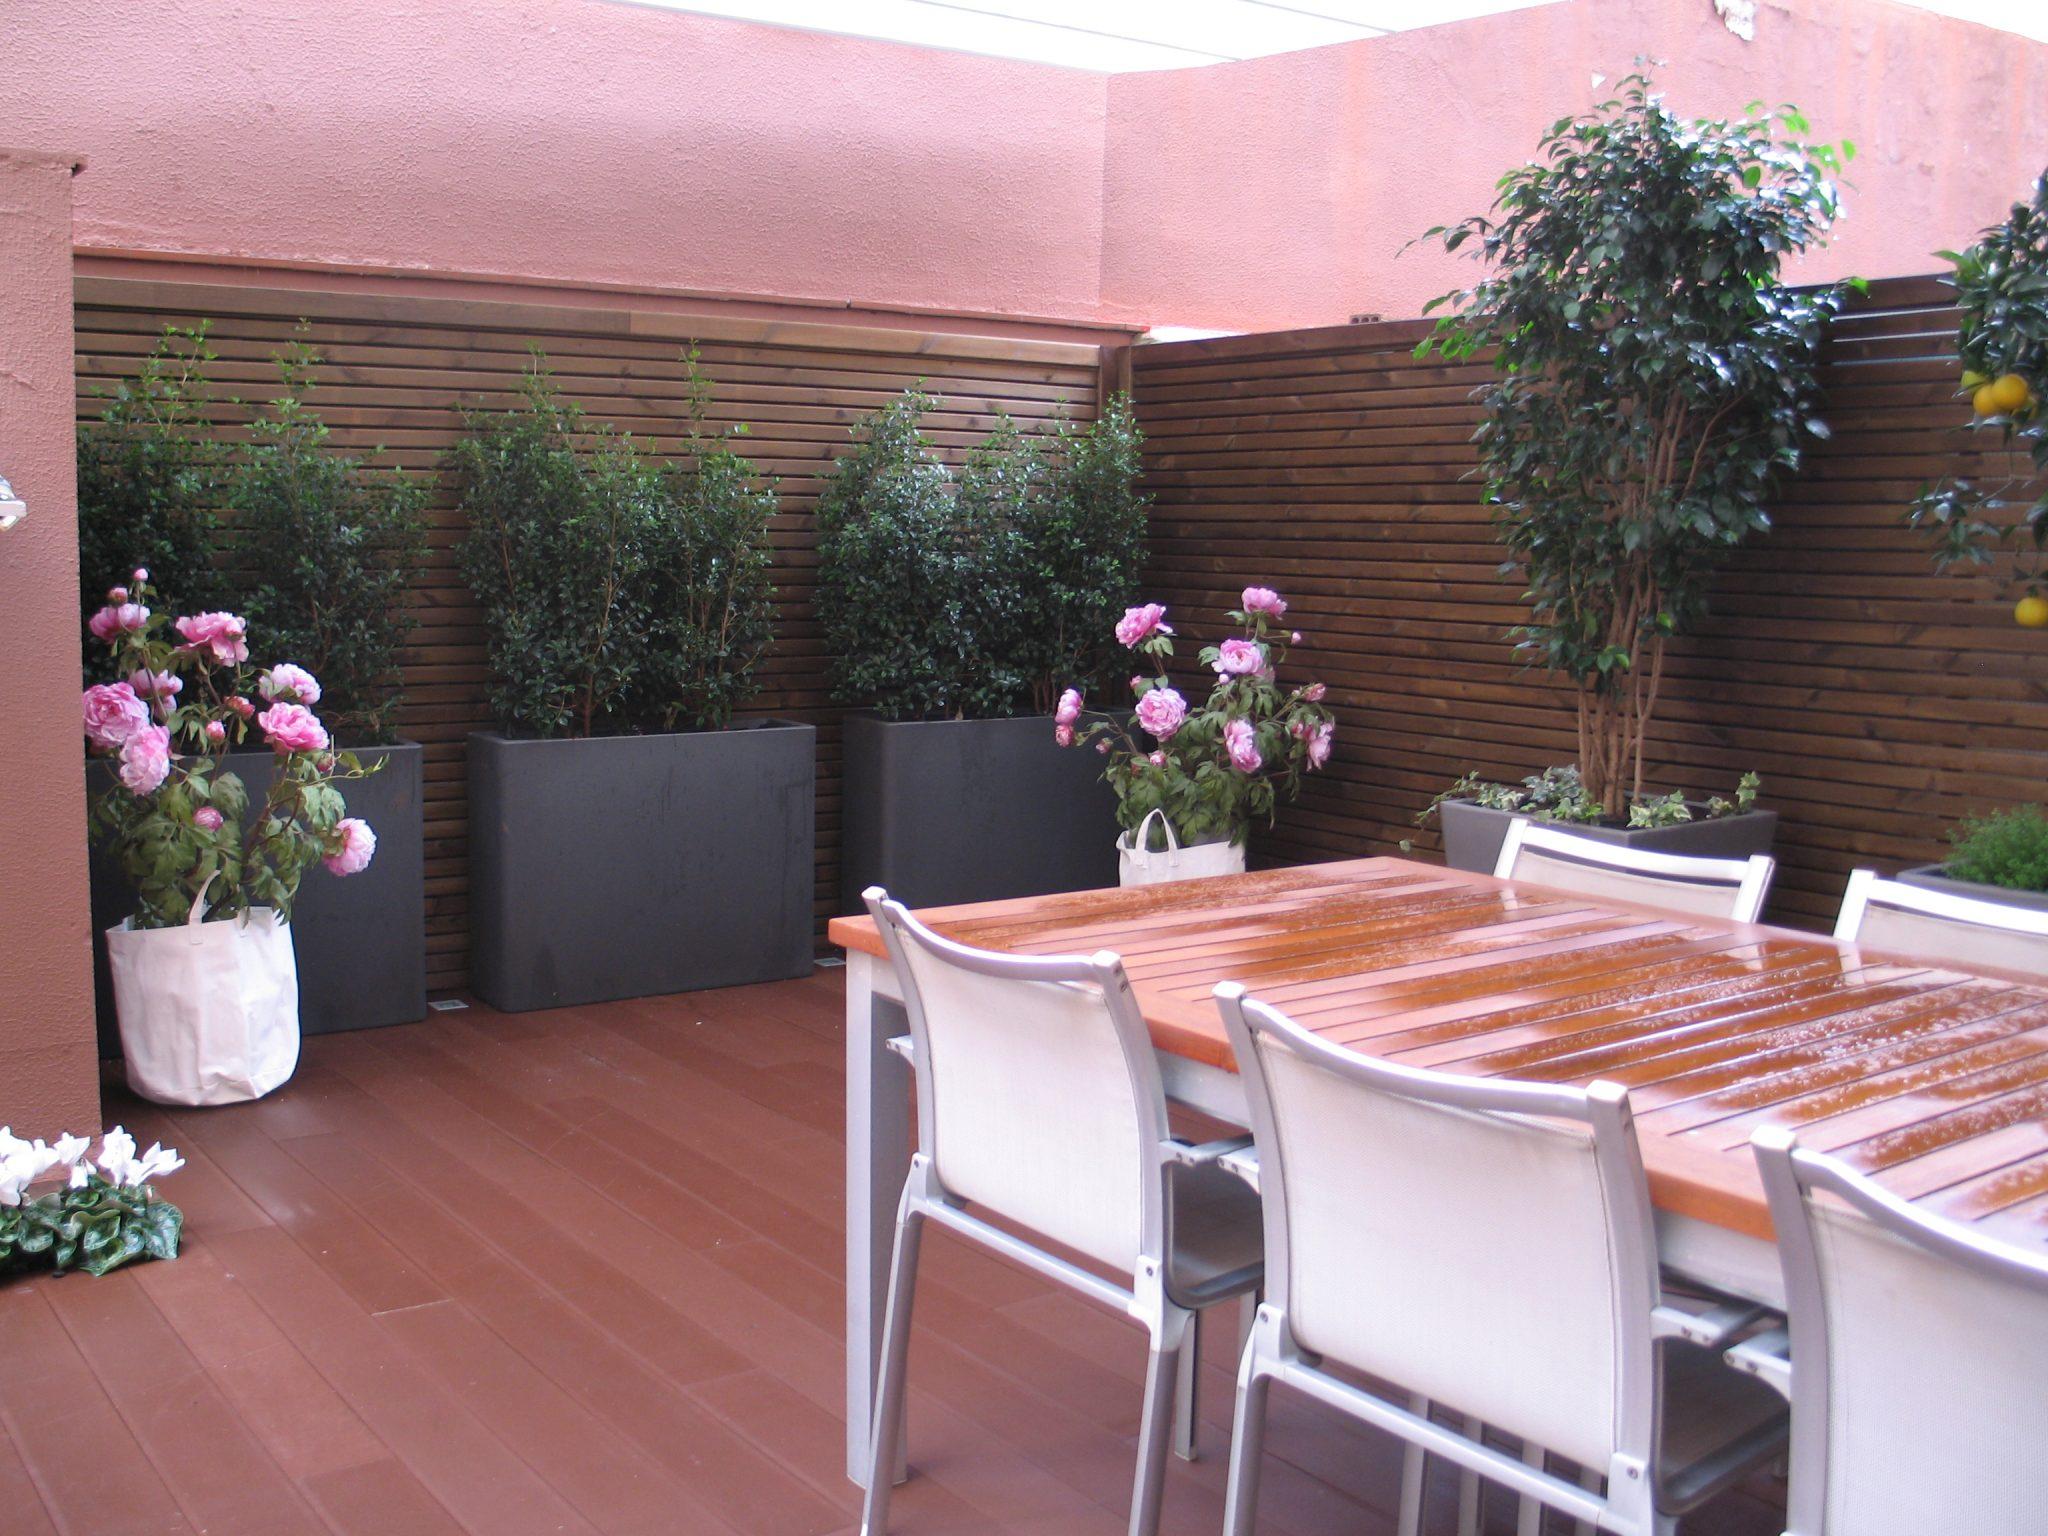 Jardineria en barcelona excellent with jardineria en - Jardineria la font ...